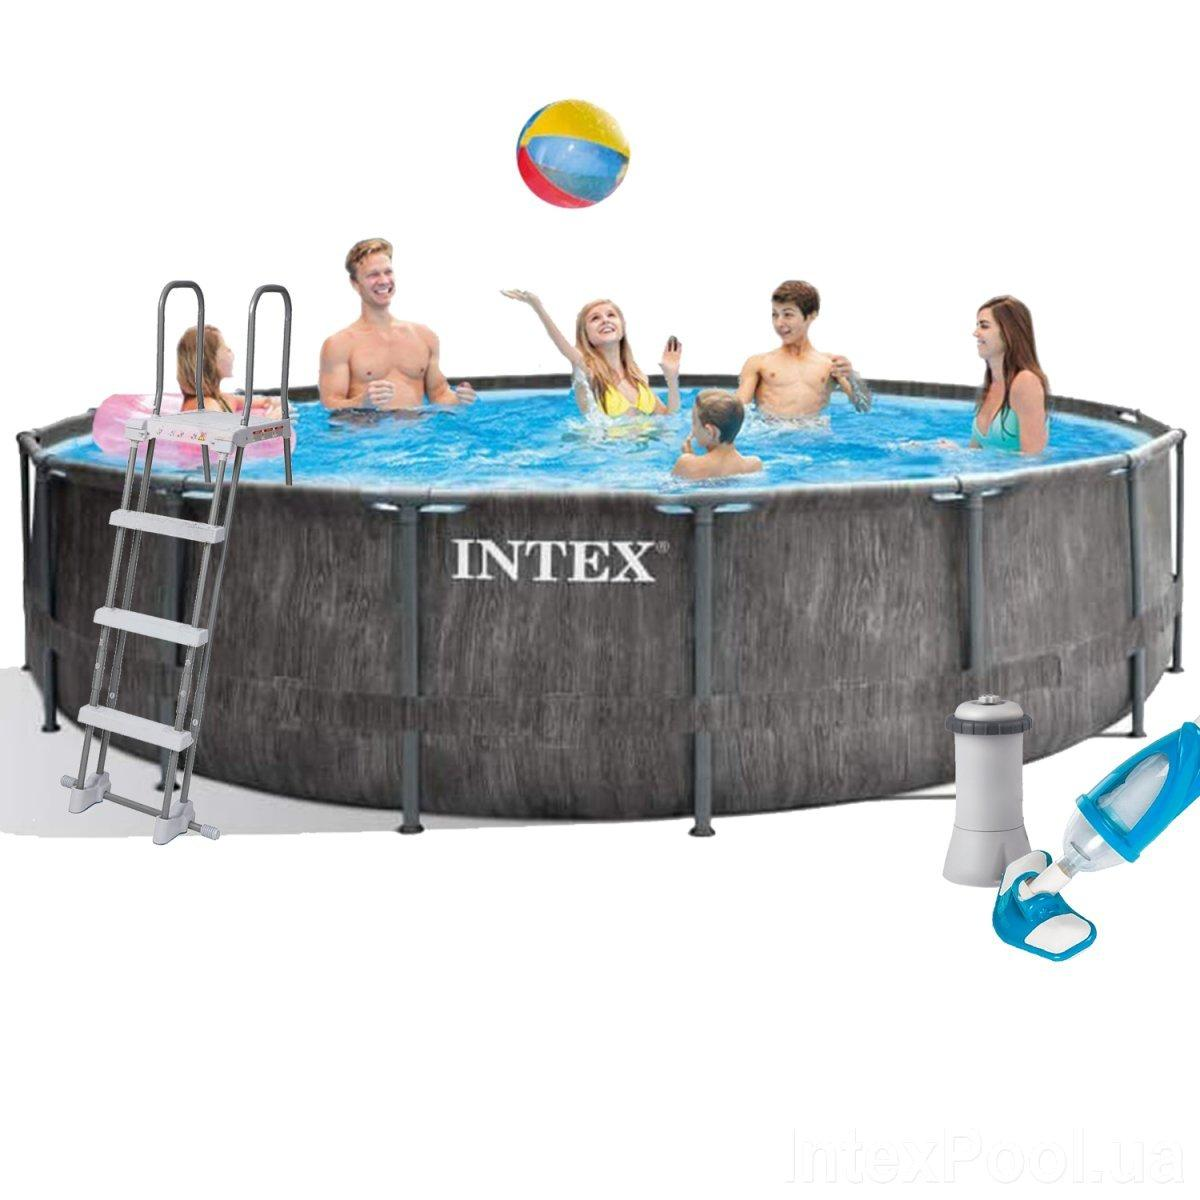 Каркасный бассейн Intex 26742 - 5, 457 x 122 см (3 785 л/ч, набор, лестница, тент, подстилка)